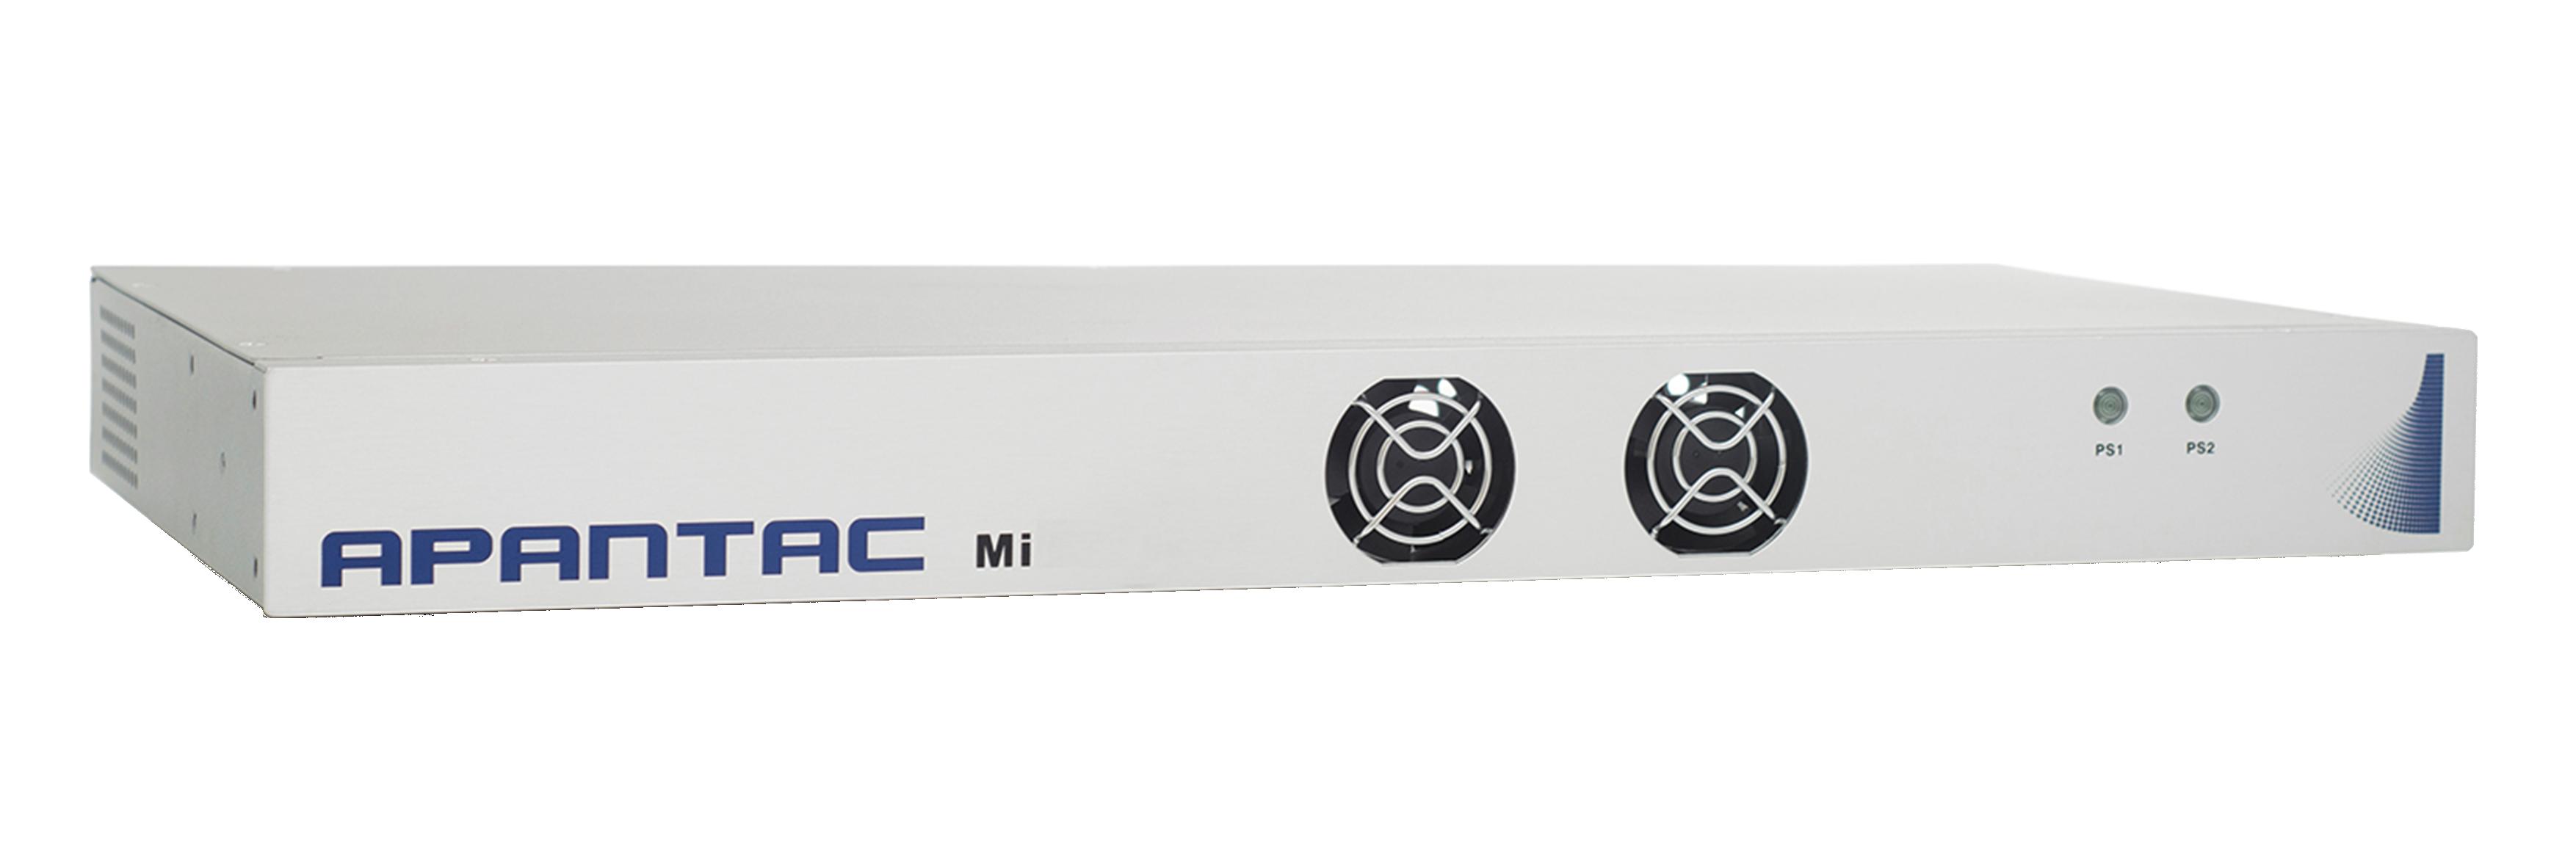 Apantac_Mi-8_Cost Effective Multiviewer